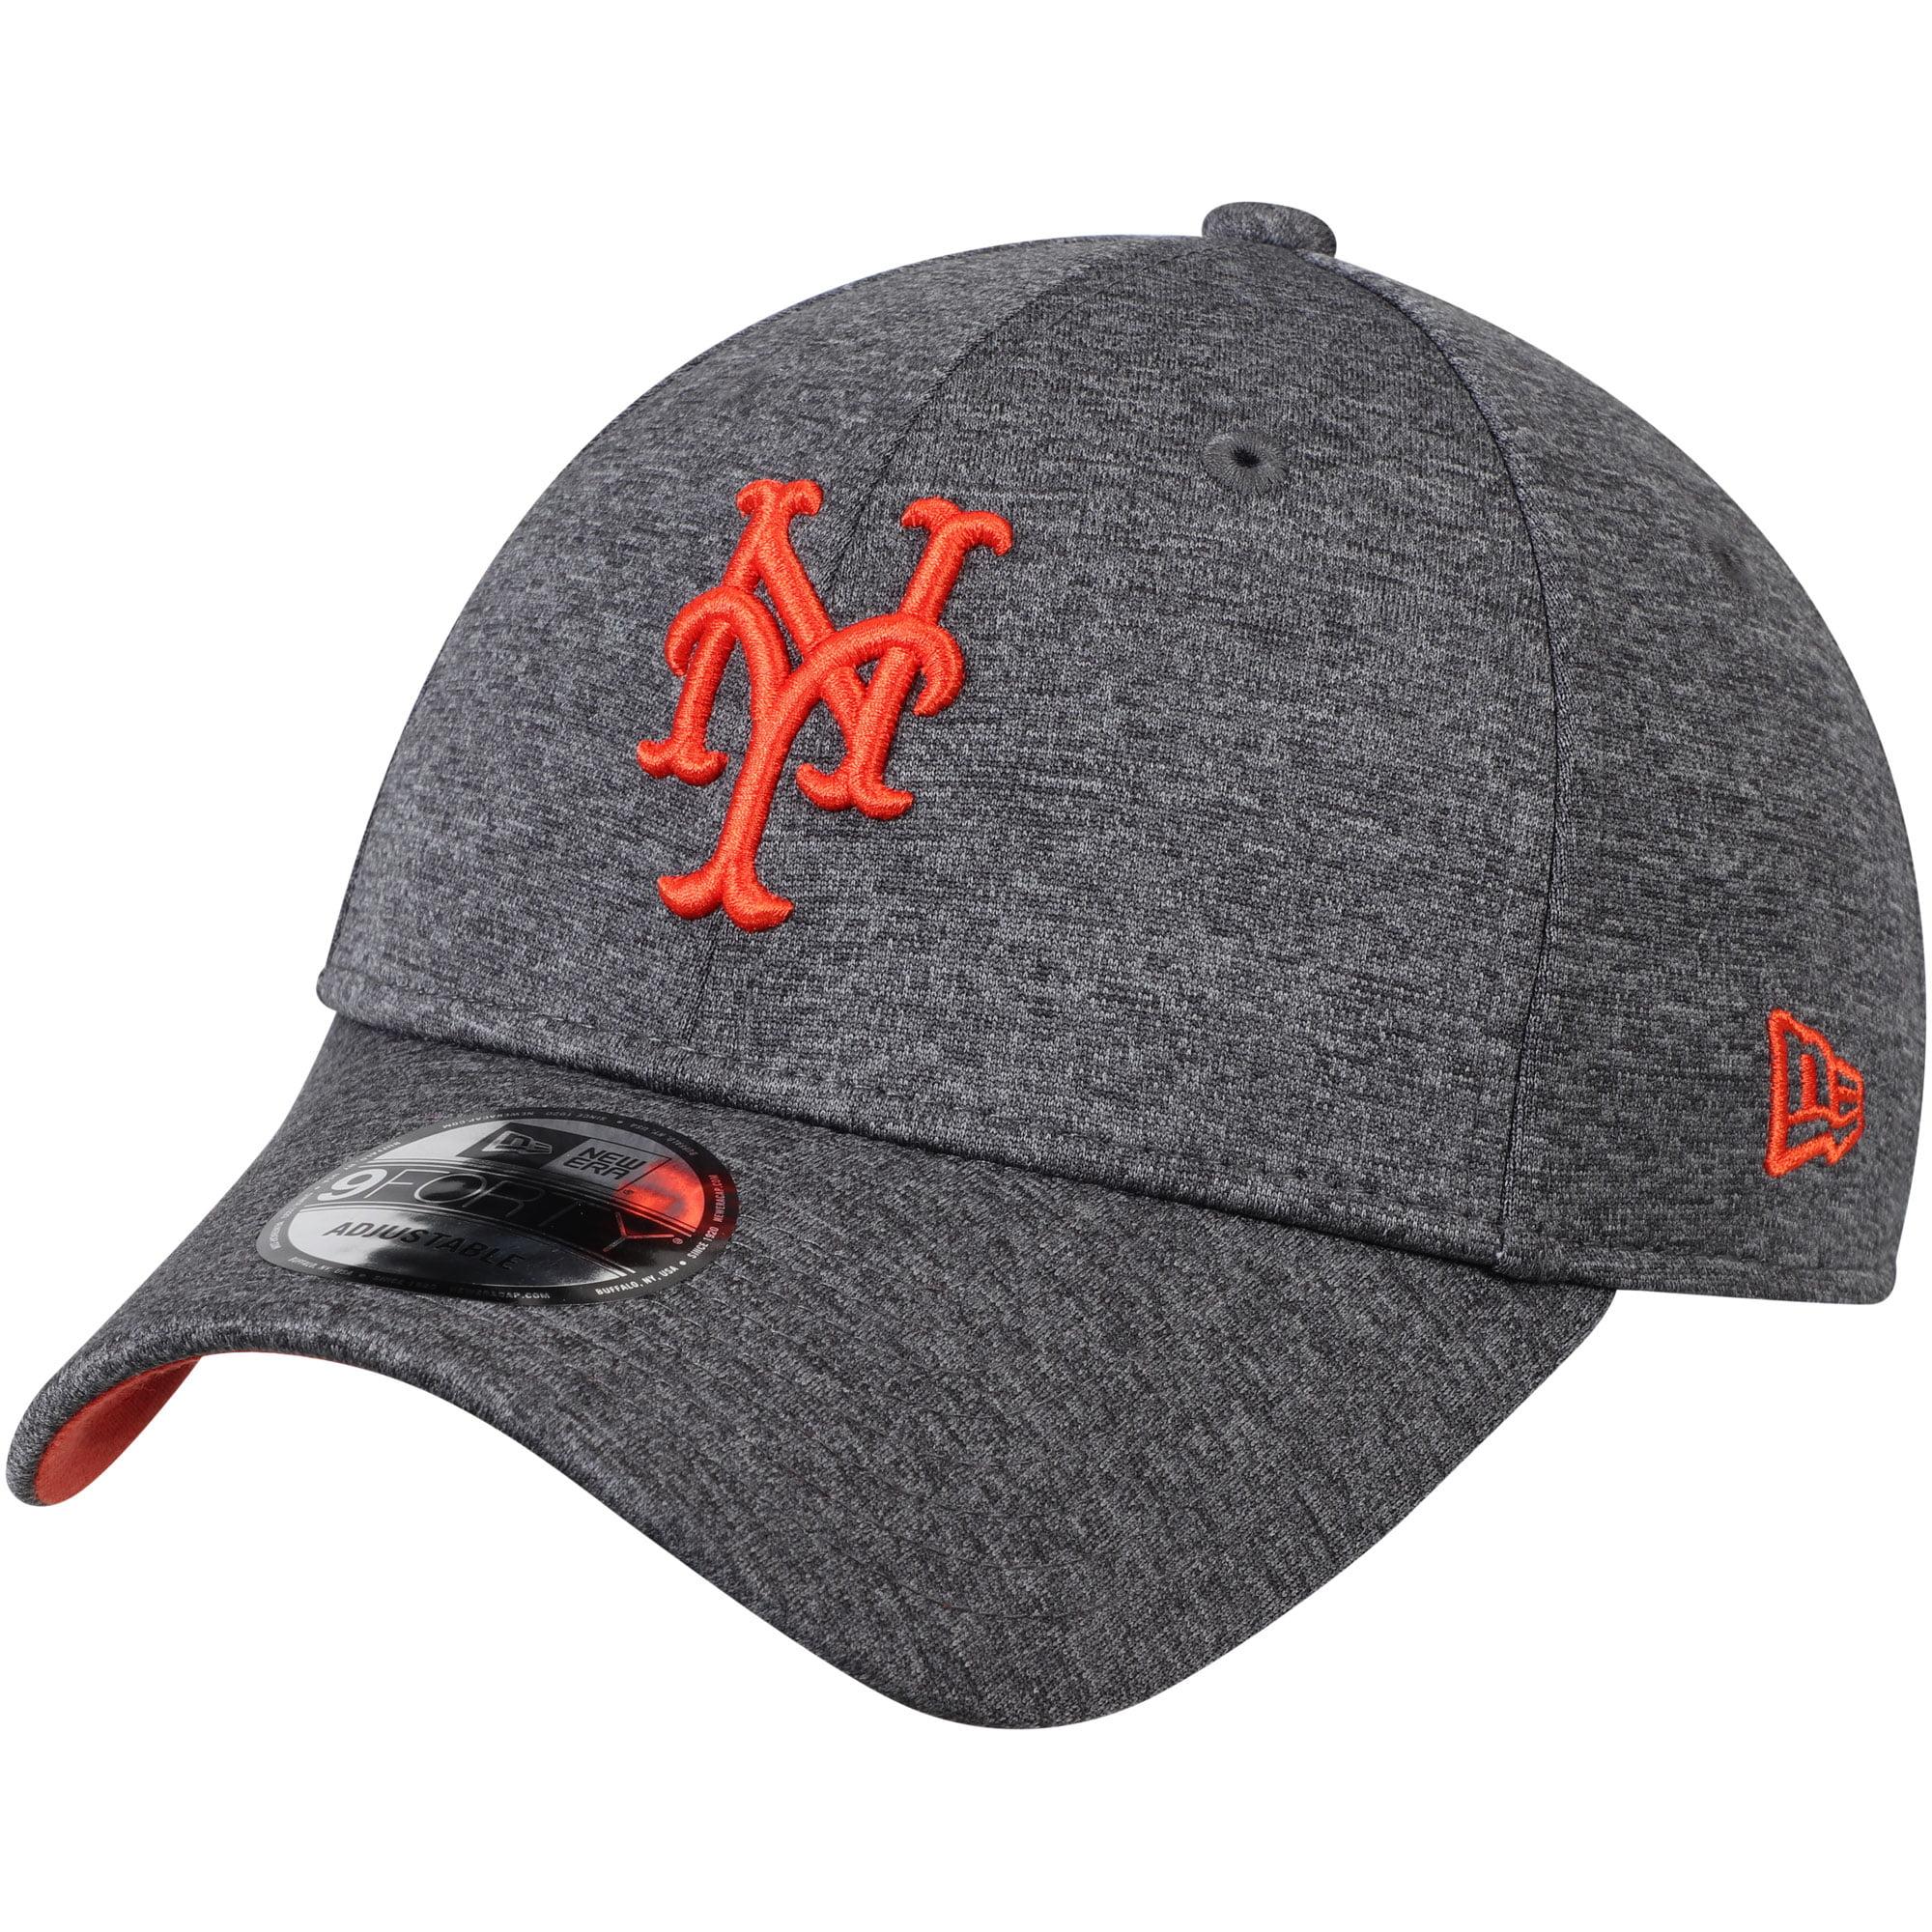 New York Mets New Era Shadow Side 9FORTY Adjustable Hat - Graphite - OSFA